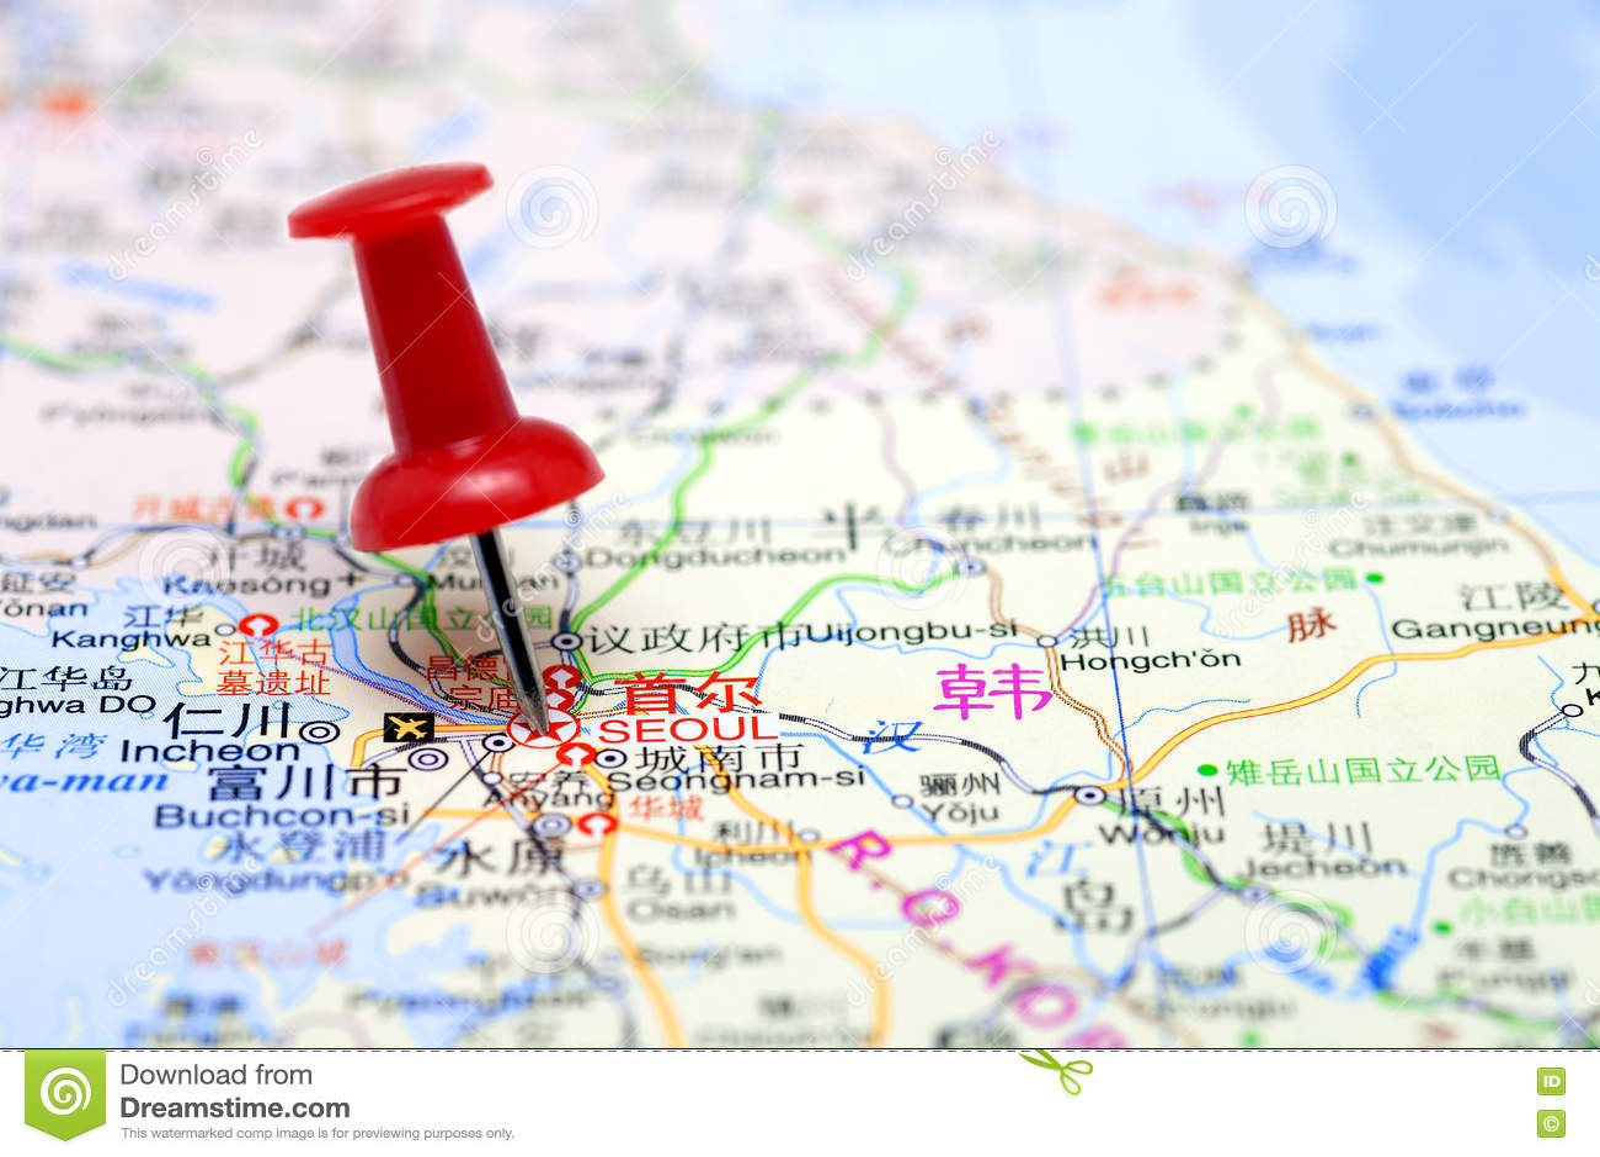 Seoul In Map Stock Photo Image Of Macro Indoors Advanced 77333388